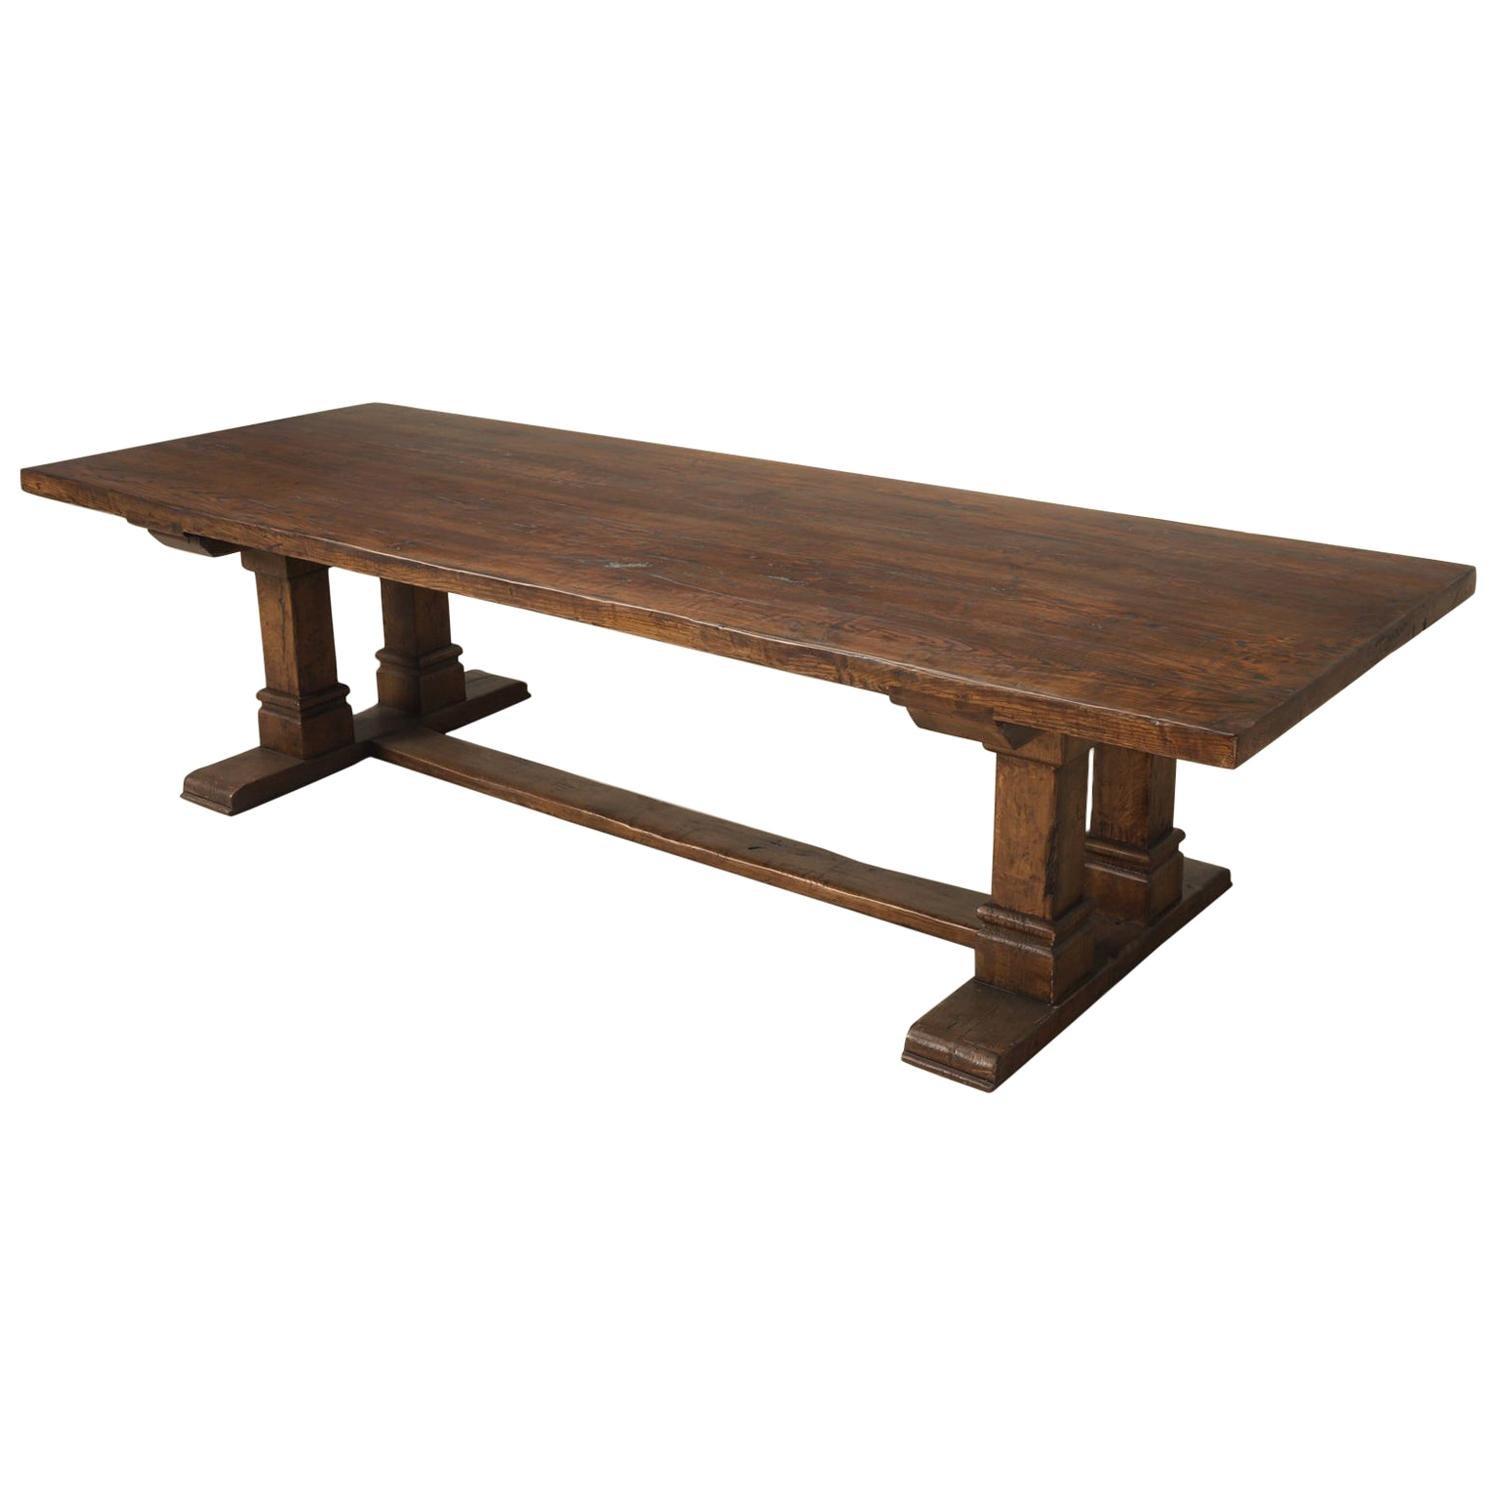 Farmhouse Trestle Dining Table in Solid Oak